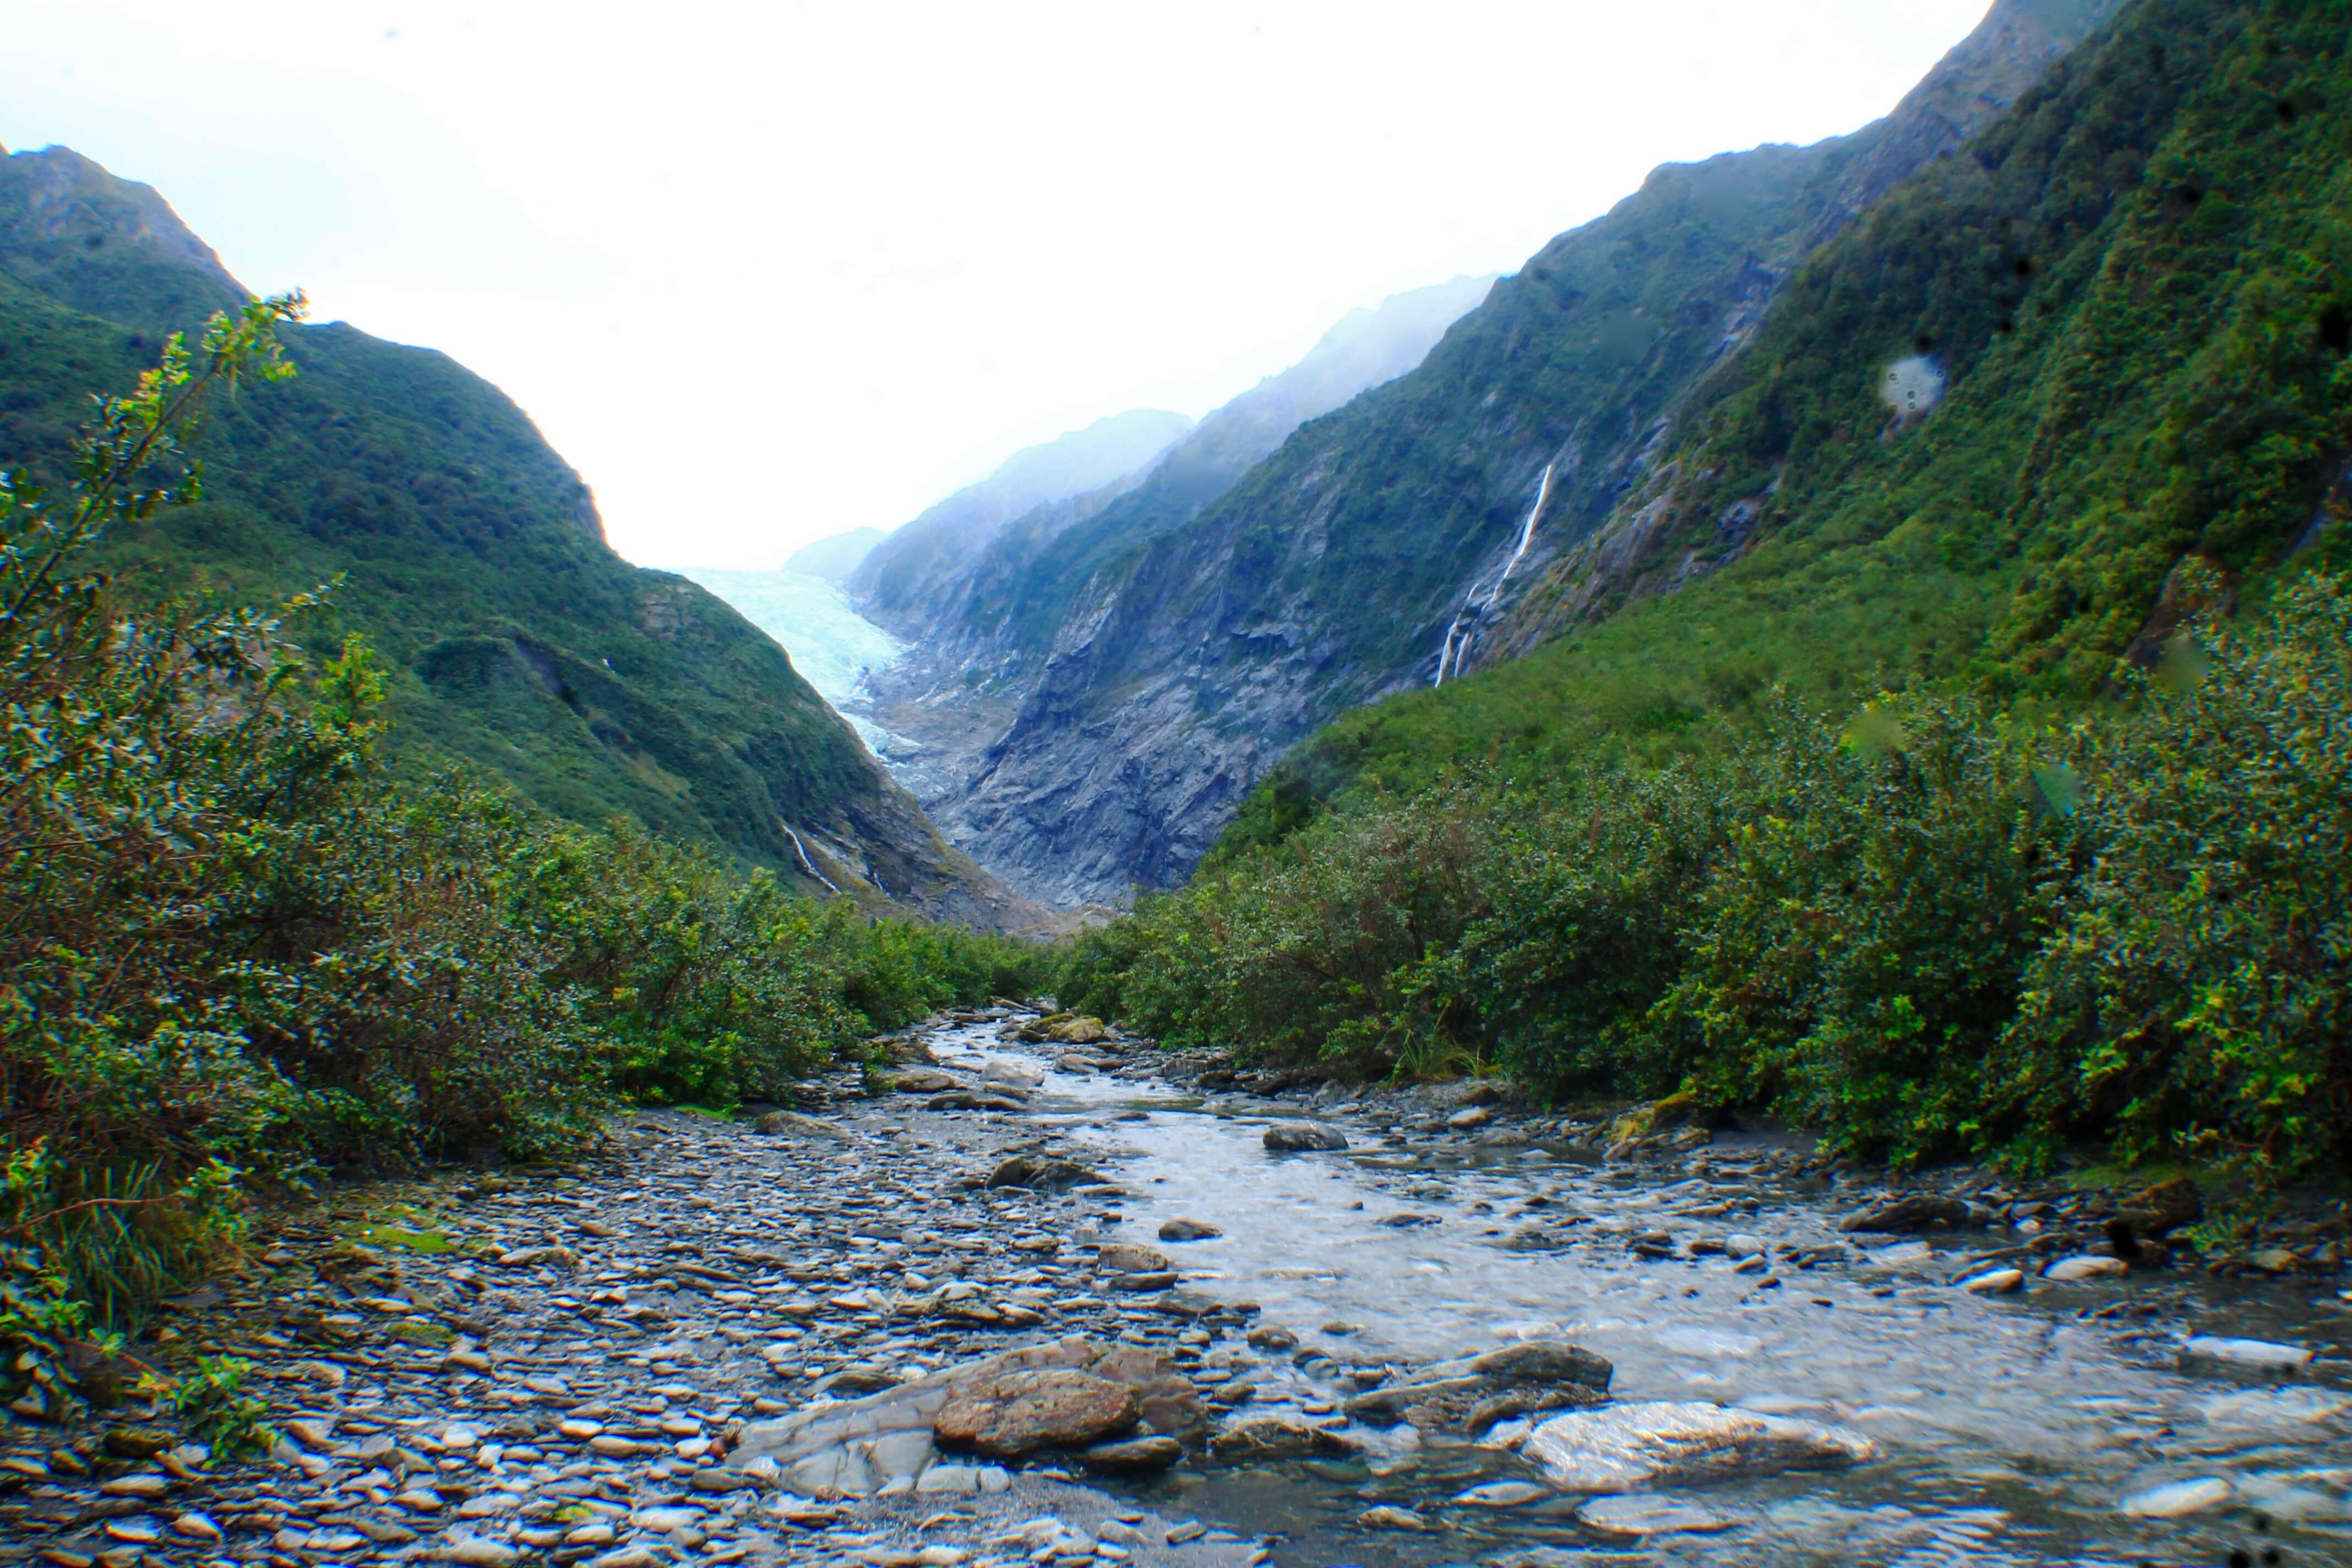 Franz Josef Glacier, Best Hikes to Epic Glaciers Around the World